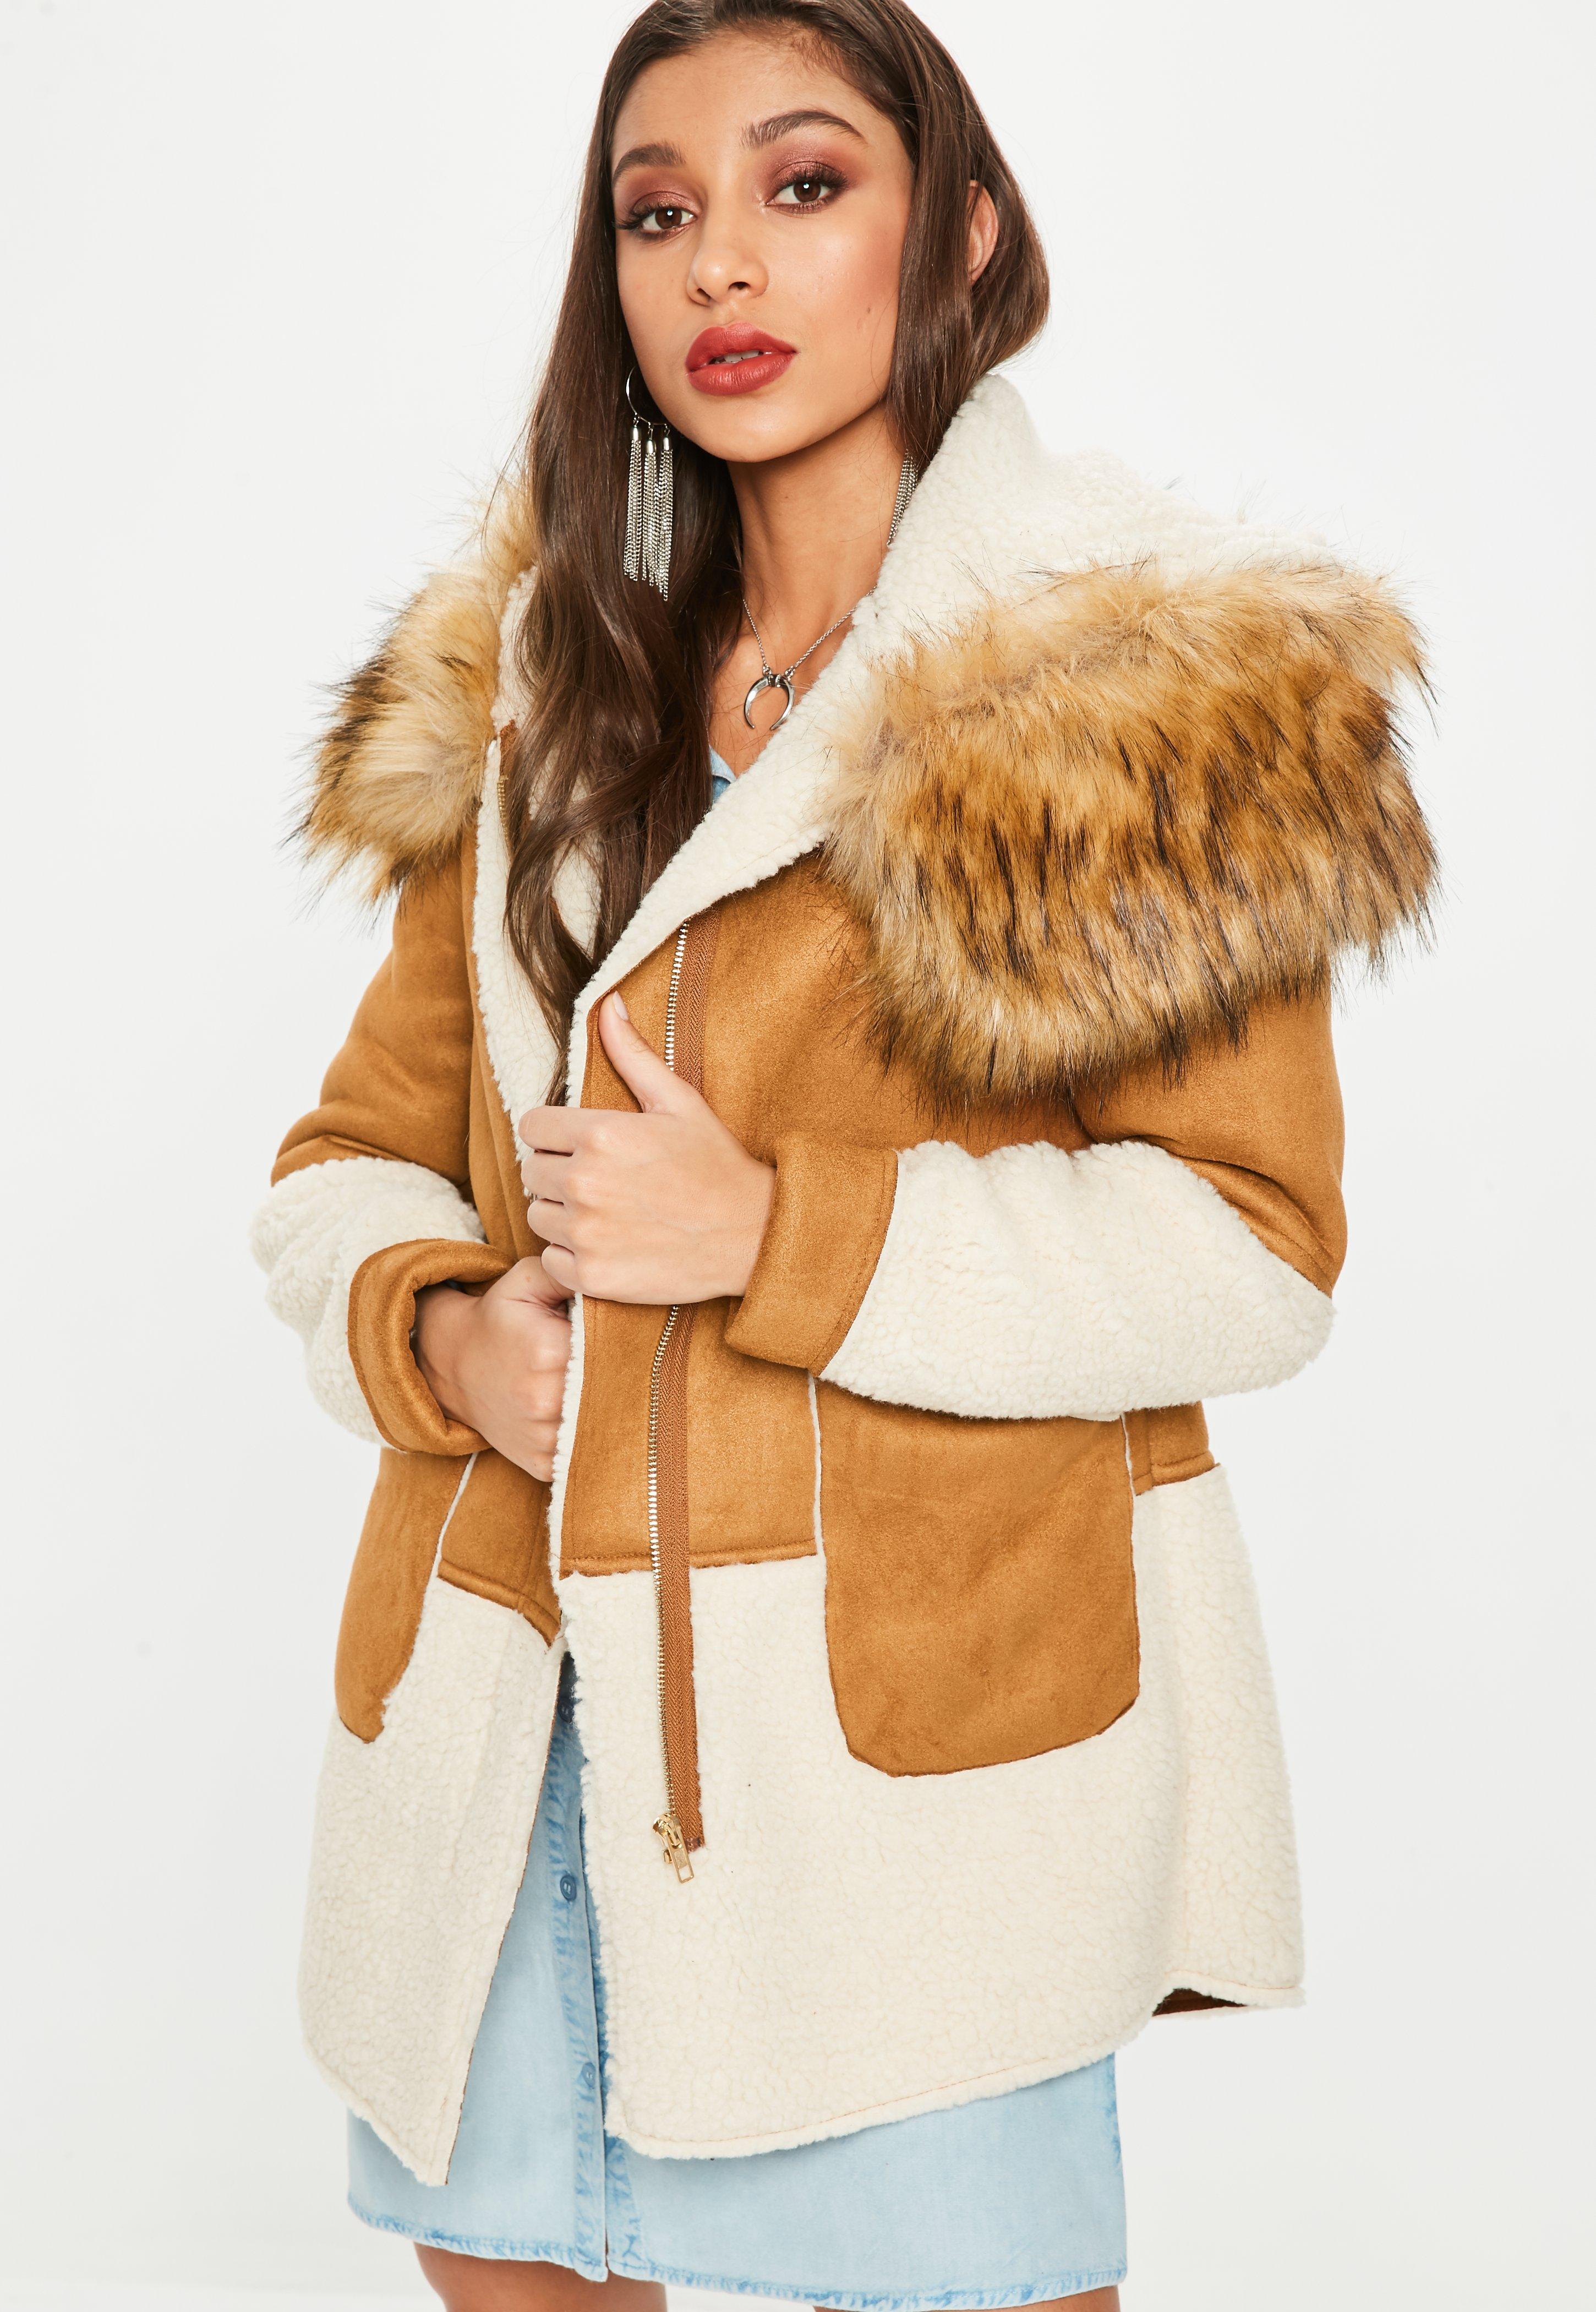 Coats | Shop Women's Jackets Online - Missguided Ireland